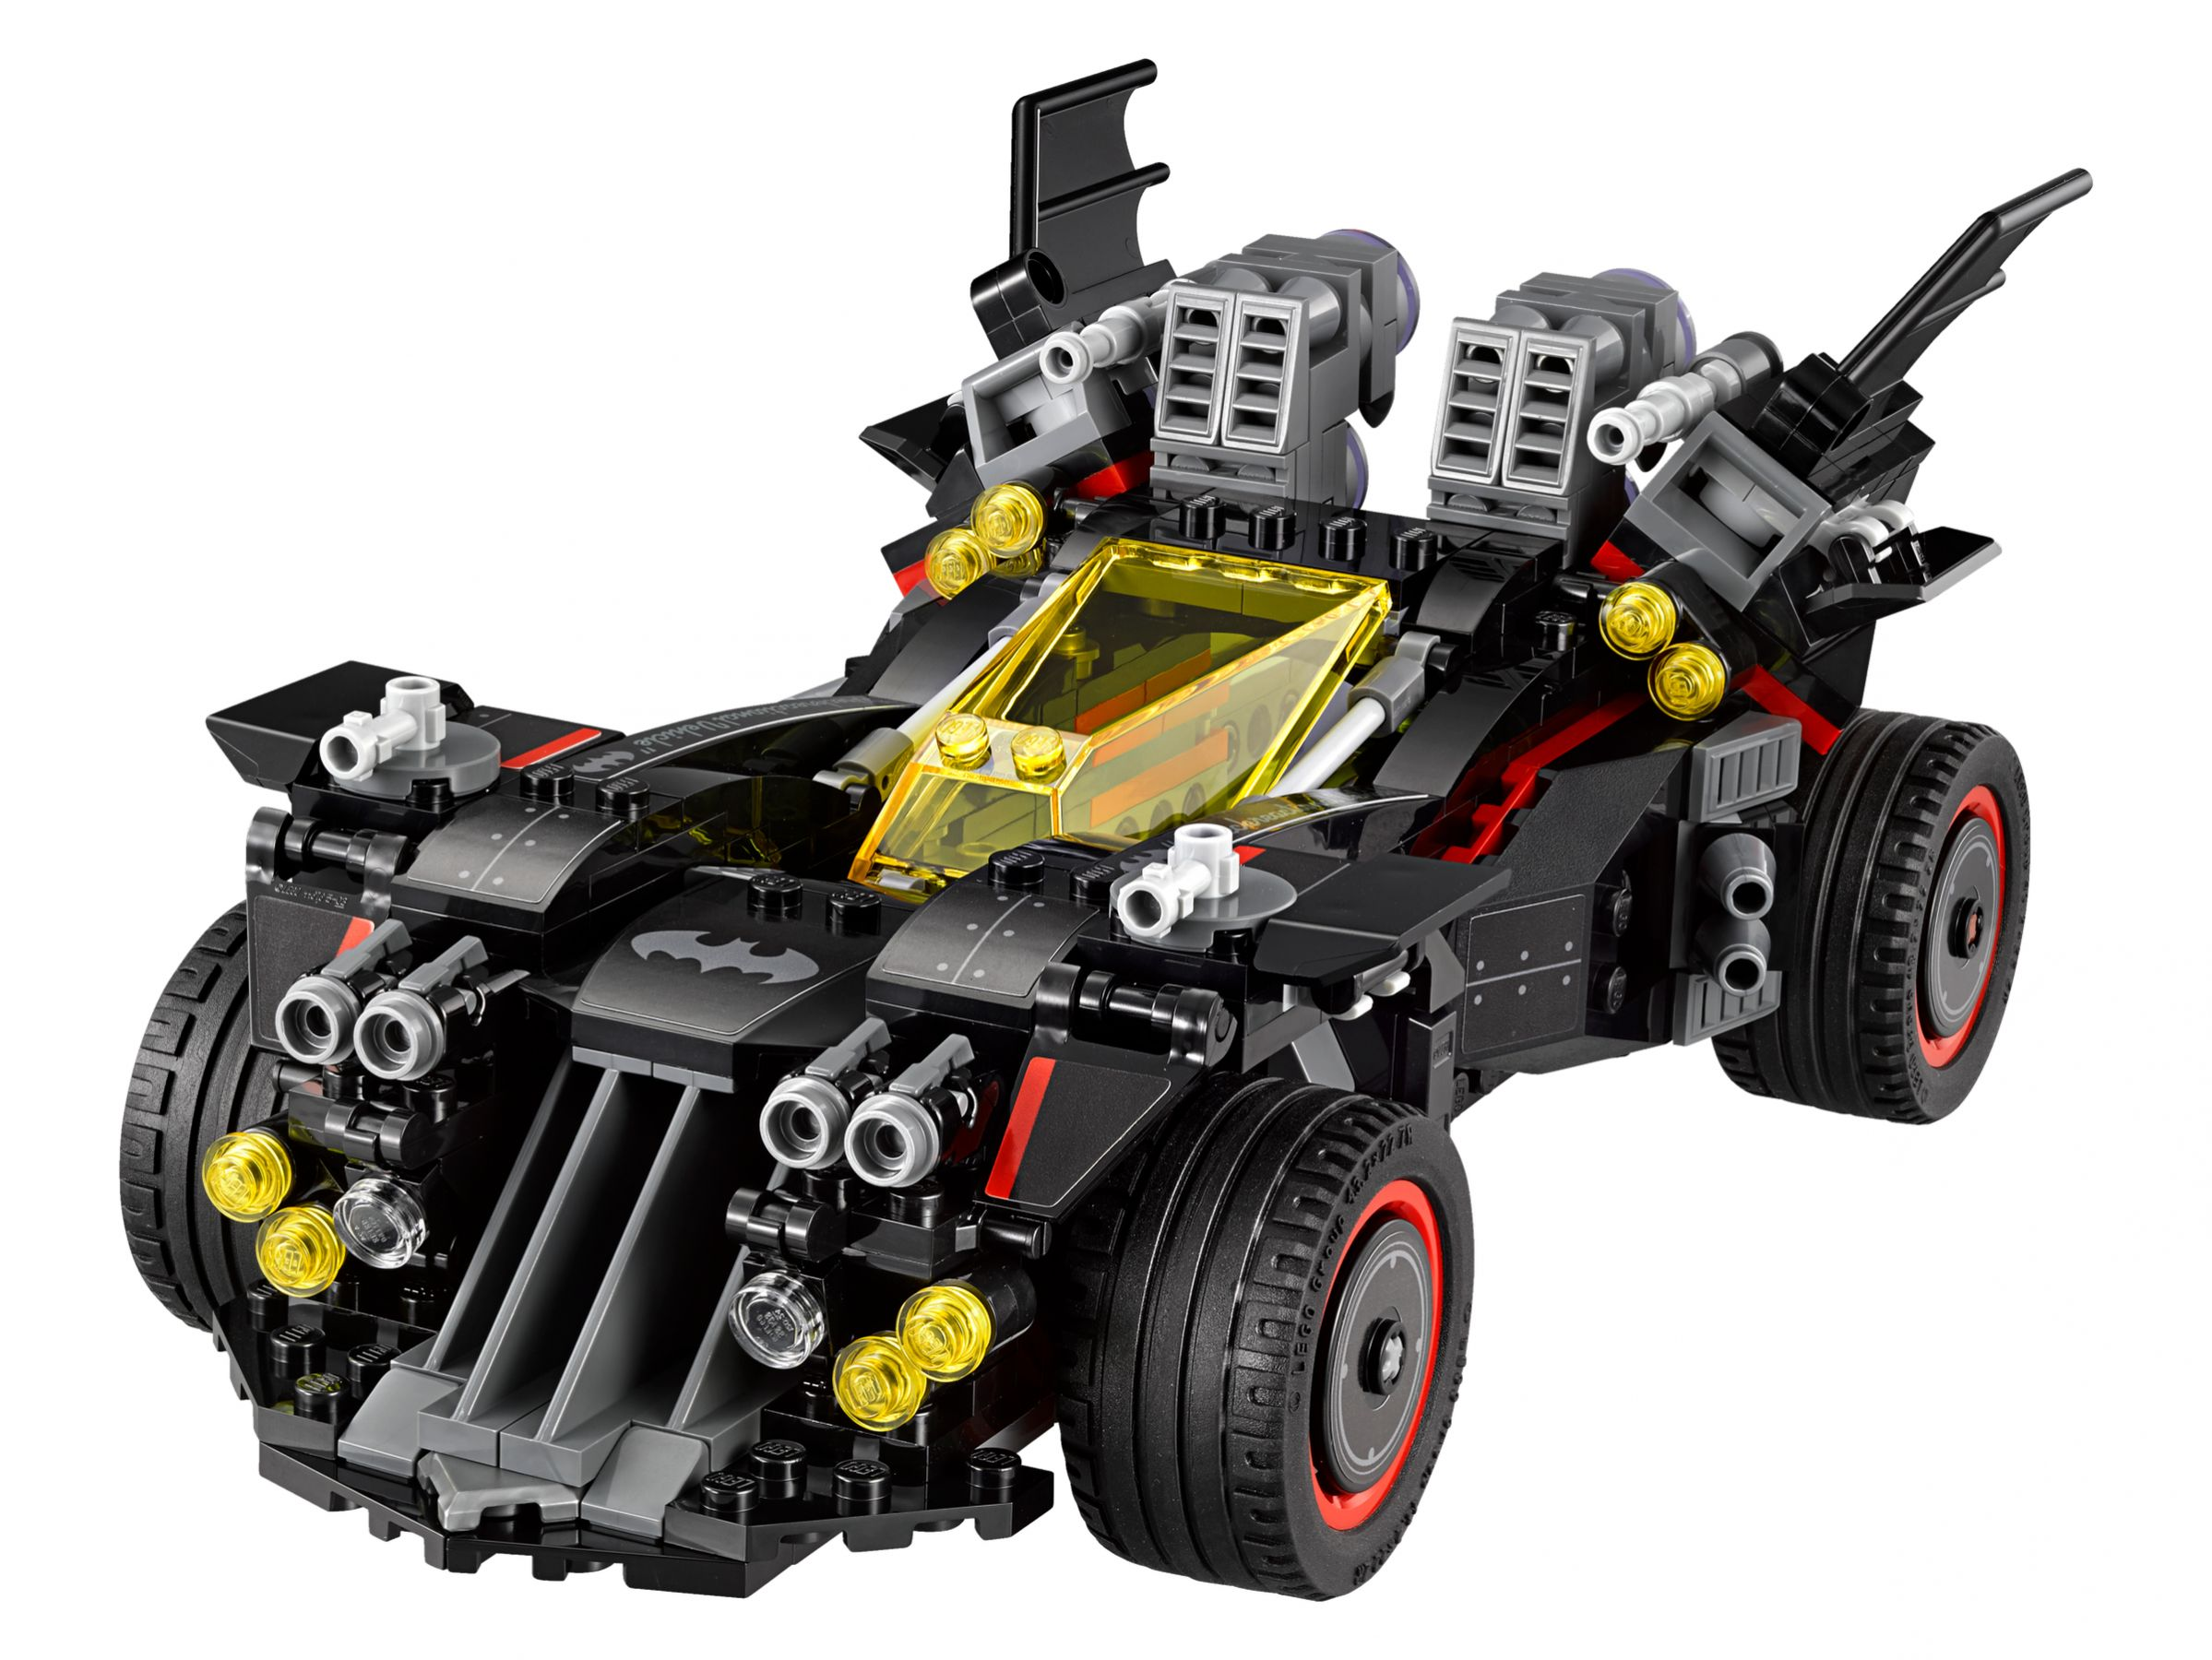 29 Ab 92 56 Ultimatives Batmobil 70917 Lego The Lego